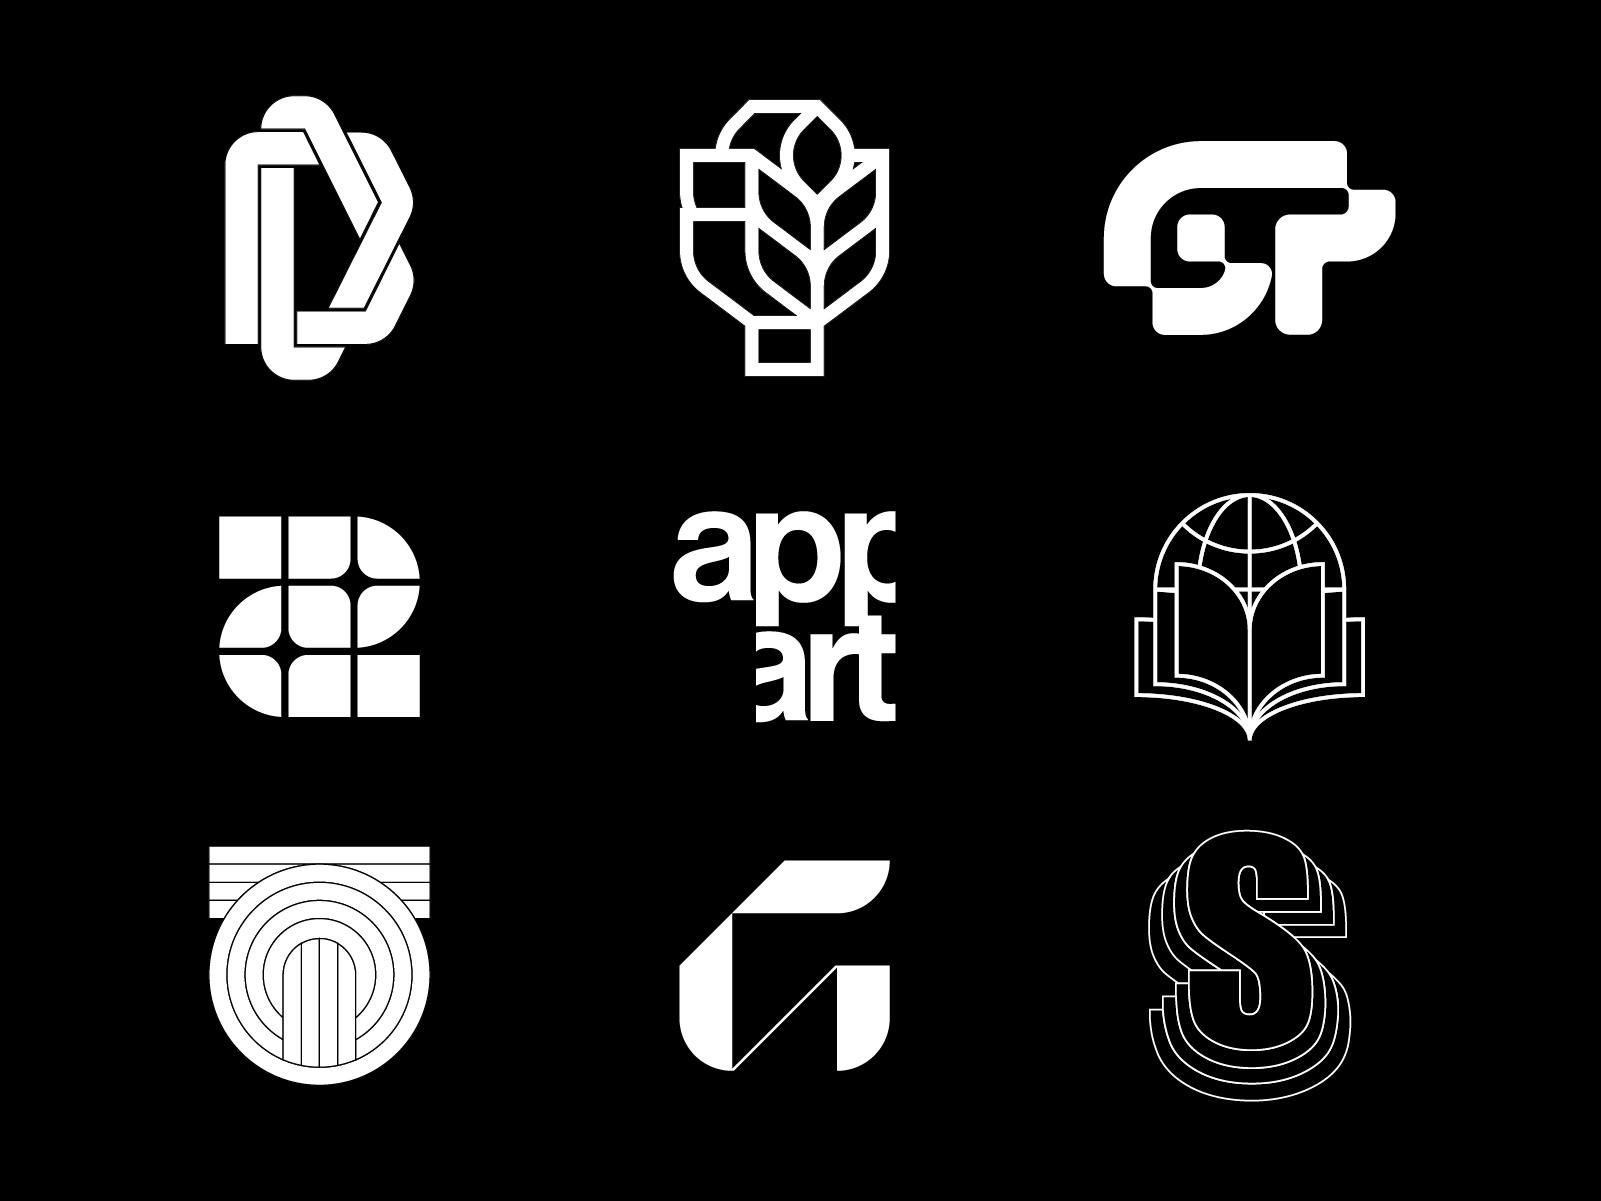 day year show 9 logos. number l - antoniocalvino | ello